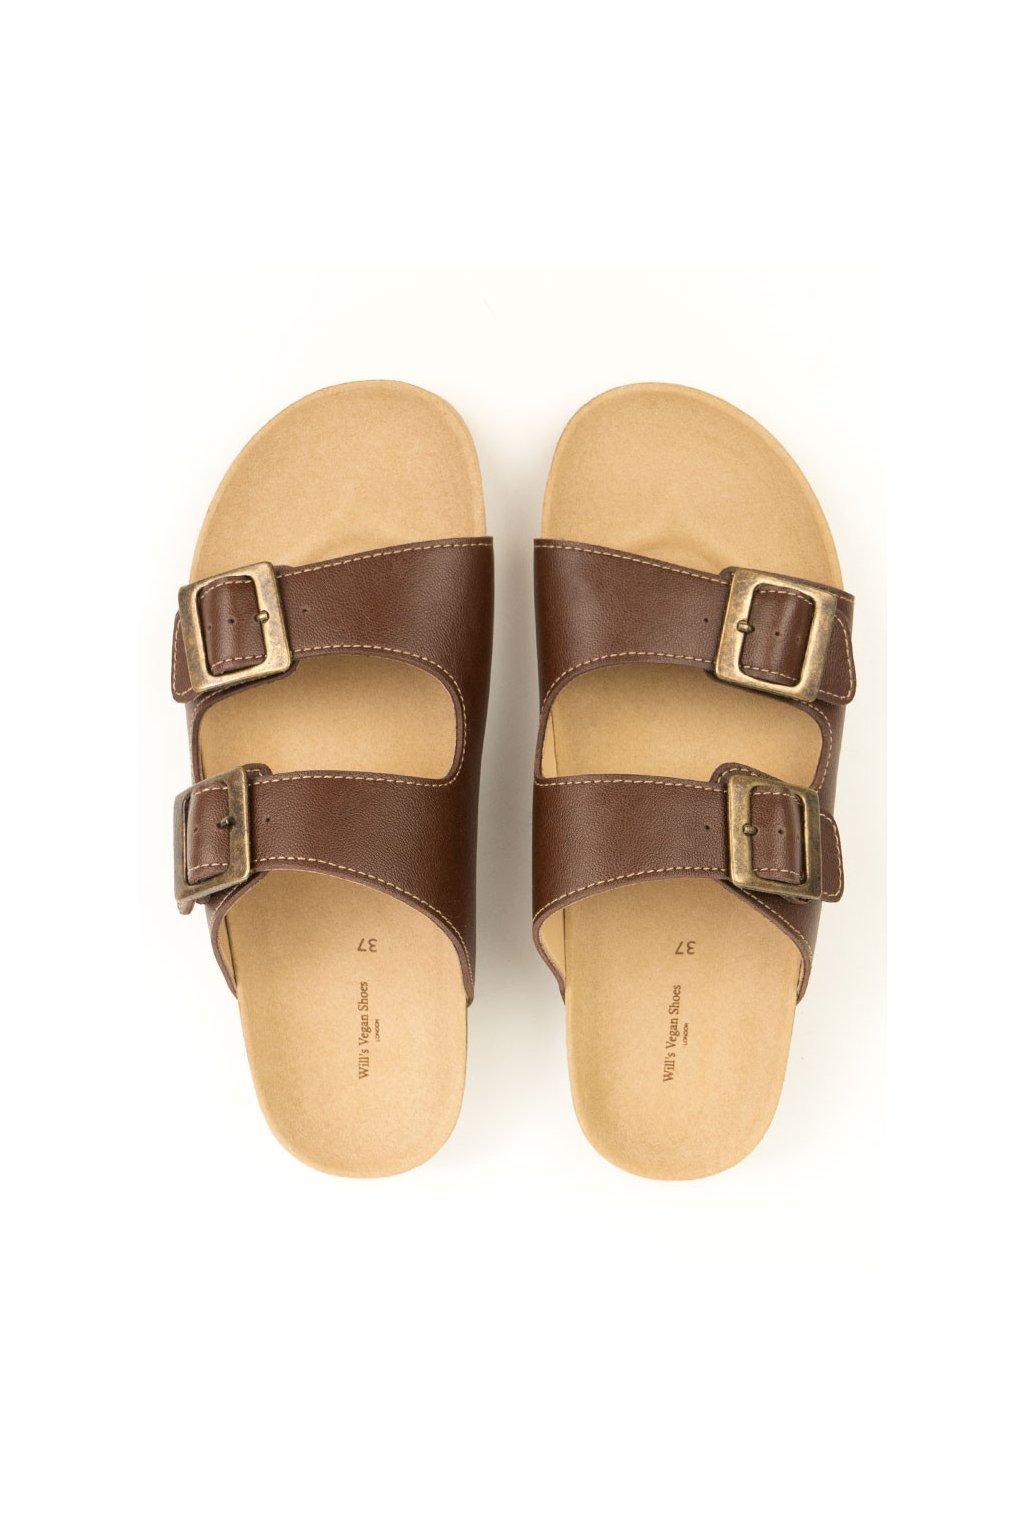 "Pánske hnedé sandále ""Footbed Sandals"" - starý model"